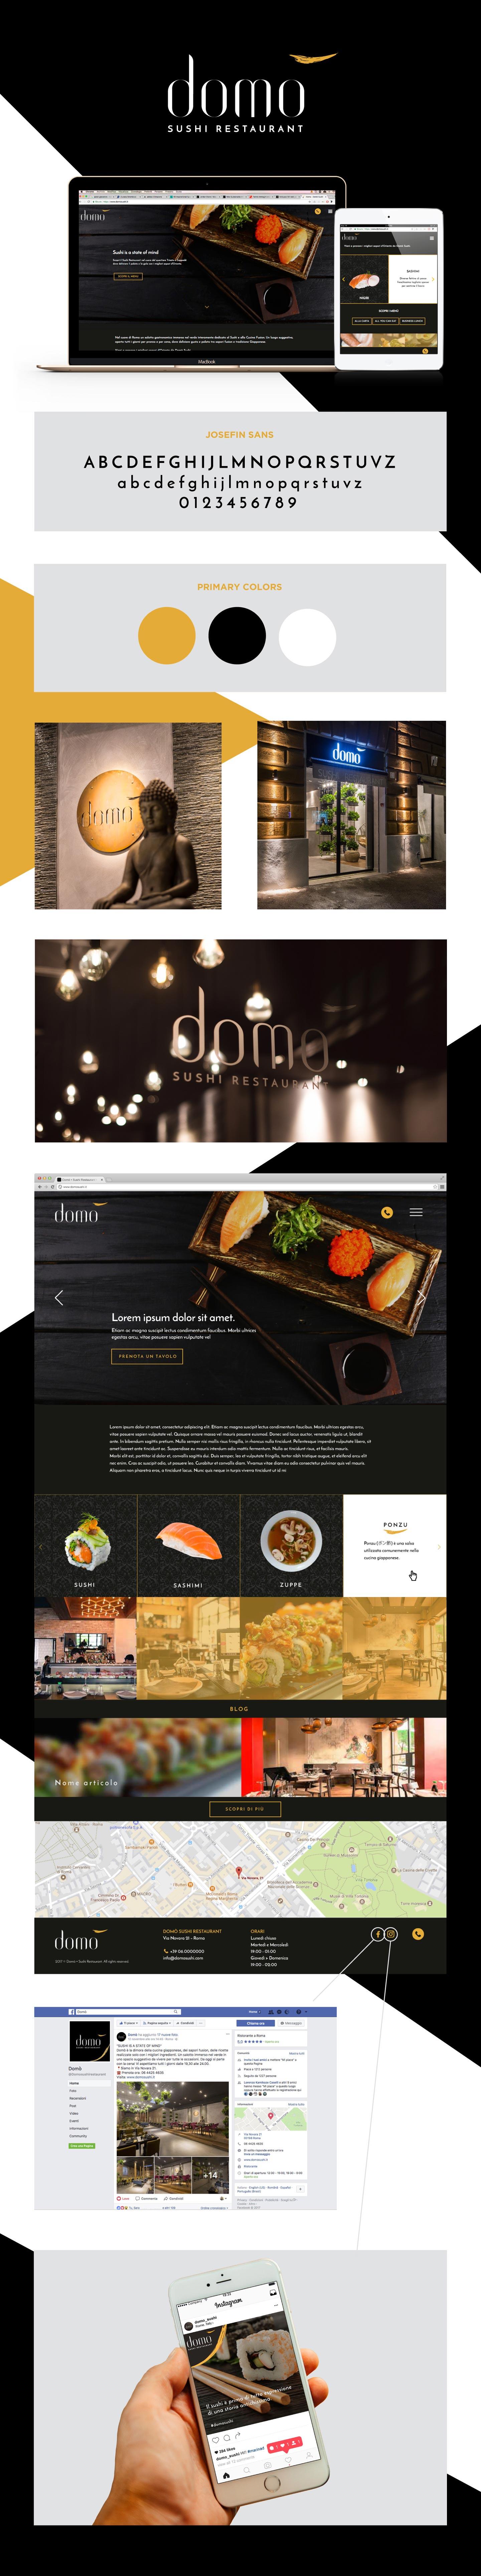 Umana Creative Studio - Progetto per Domò Sushi Restaurant Roma